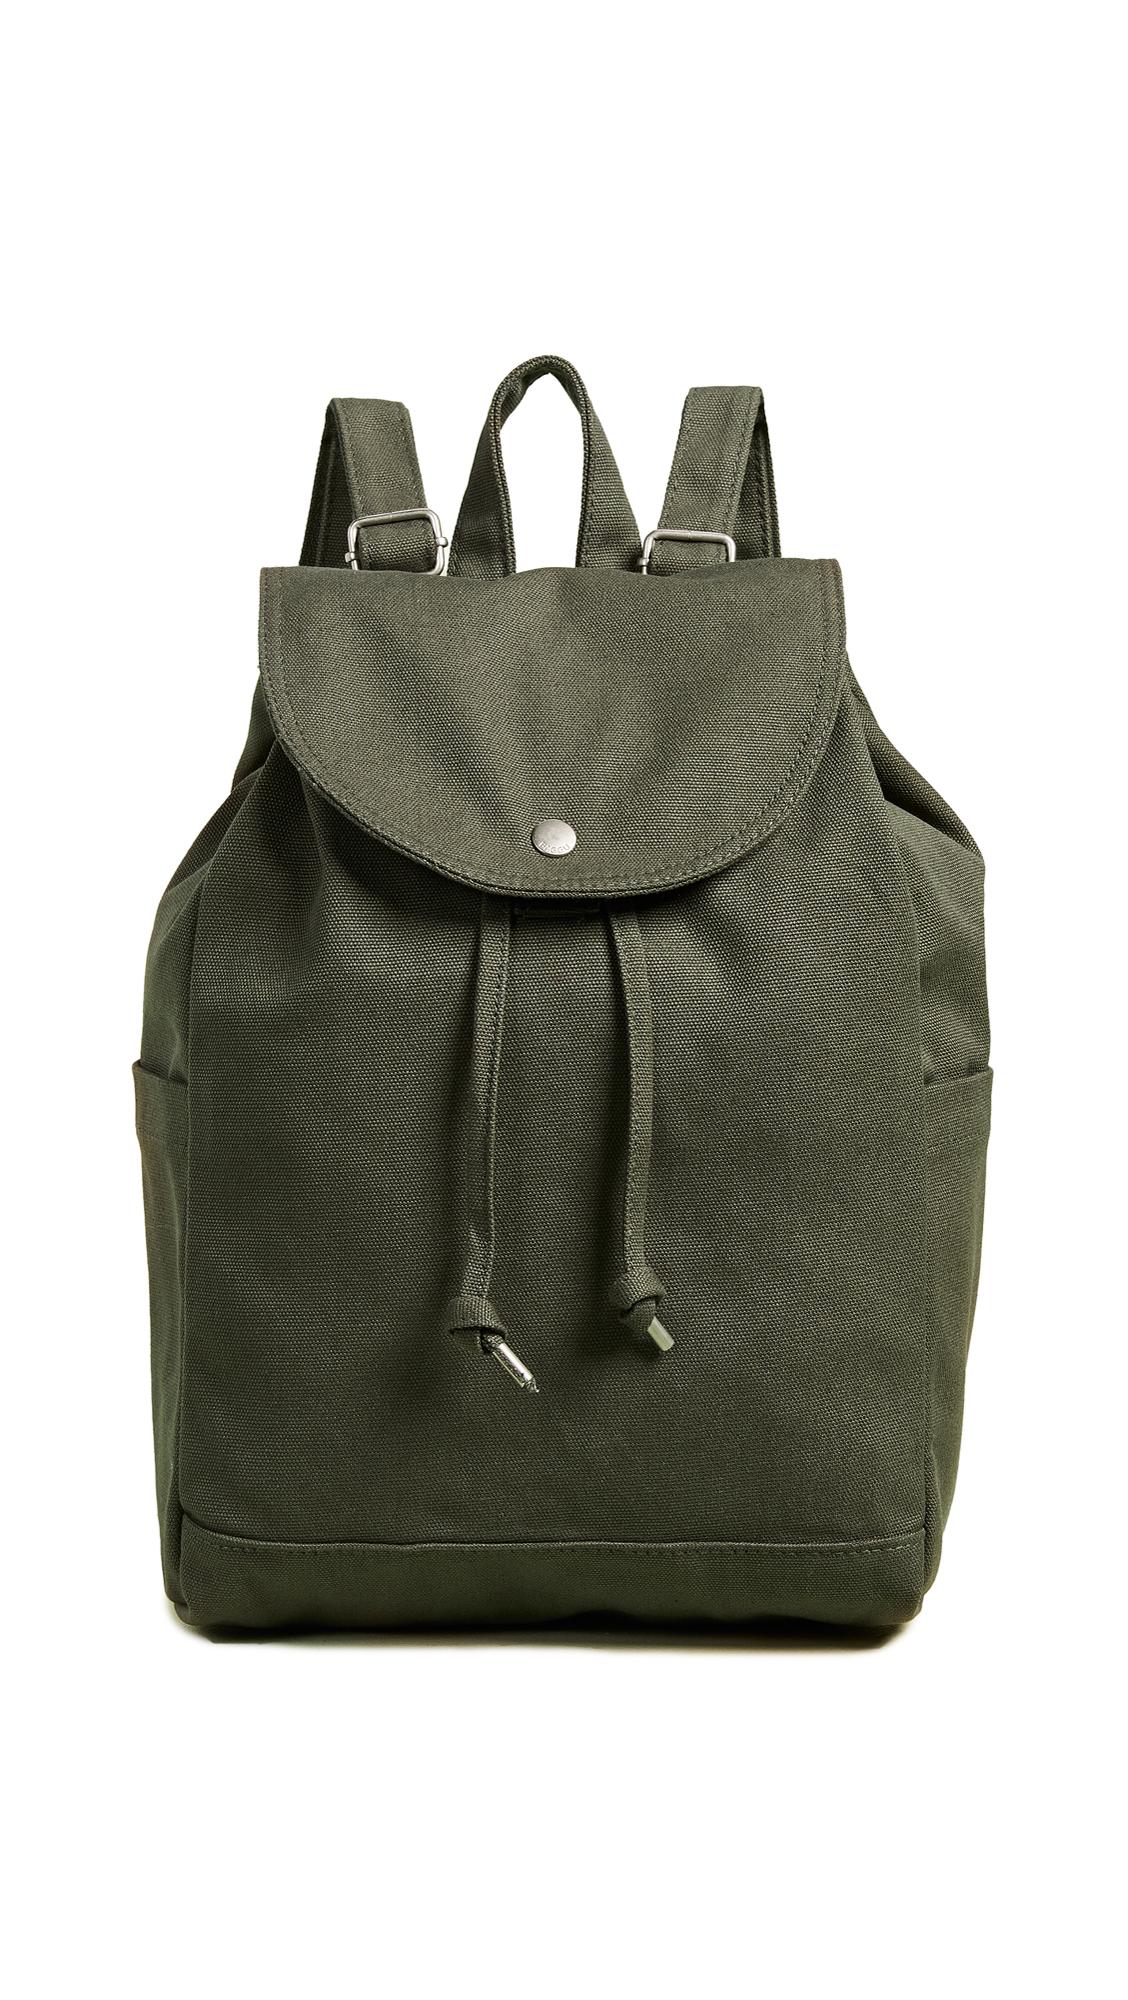 BAGGU Drawstring Backpack in Dark Olive